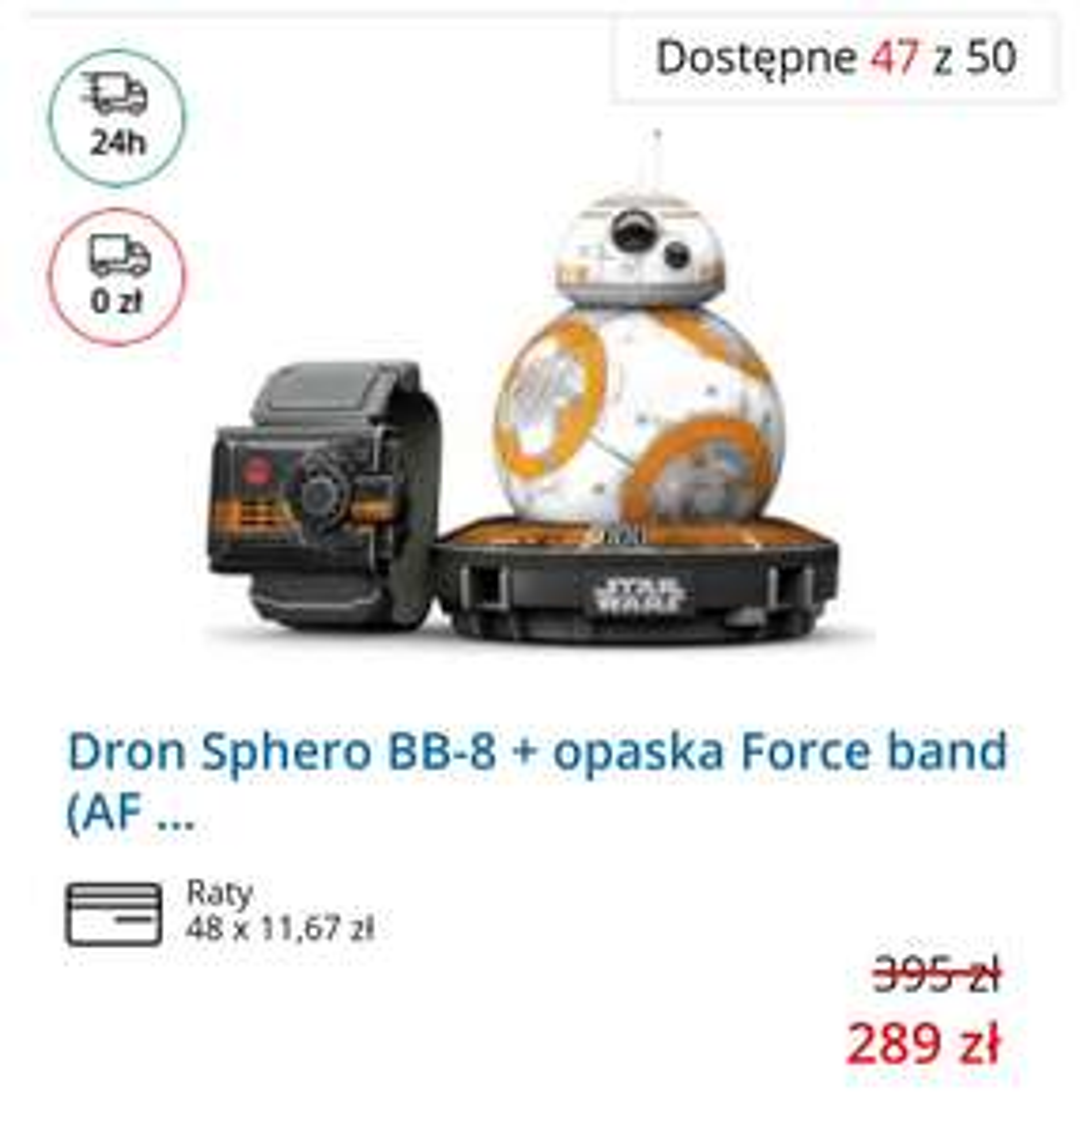 Sphero BB-8 + opaska Force band. Darmowa dostawa.